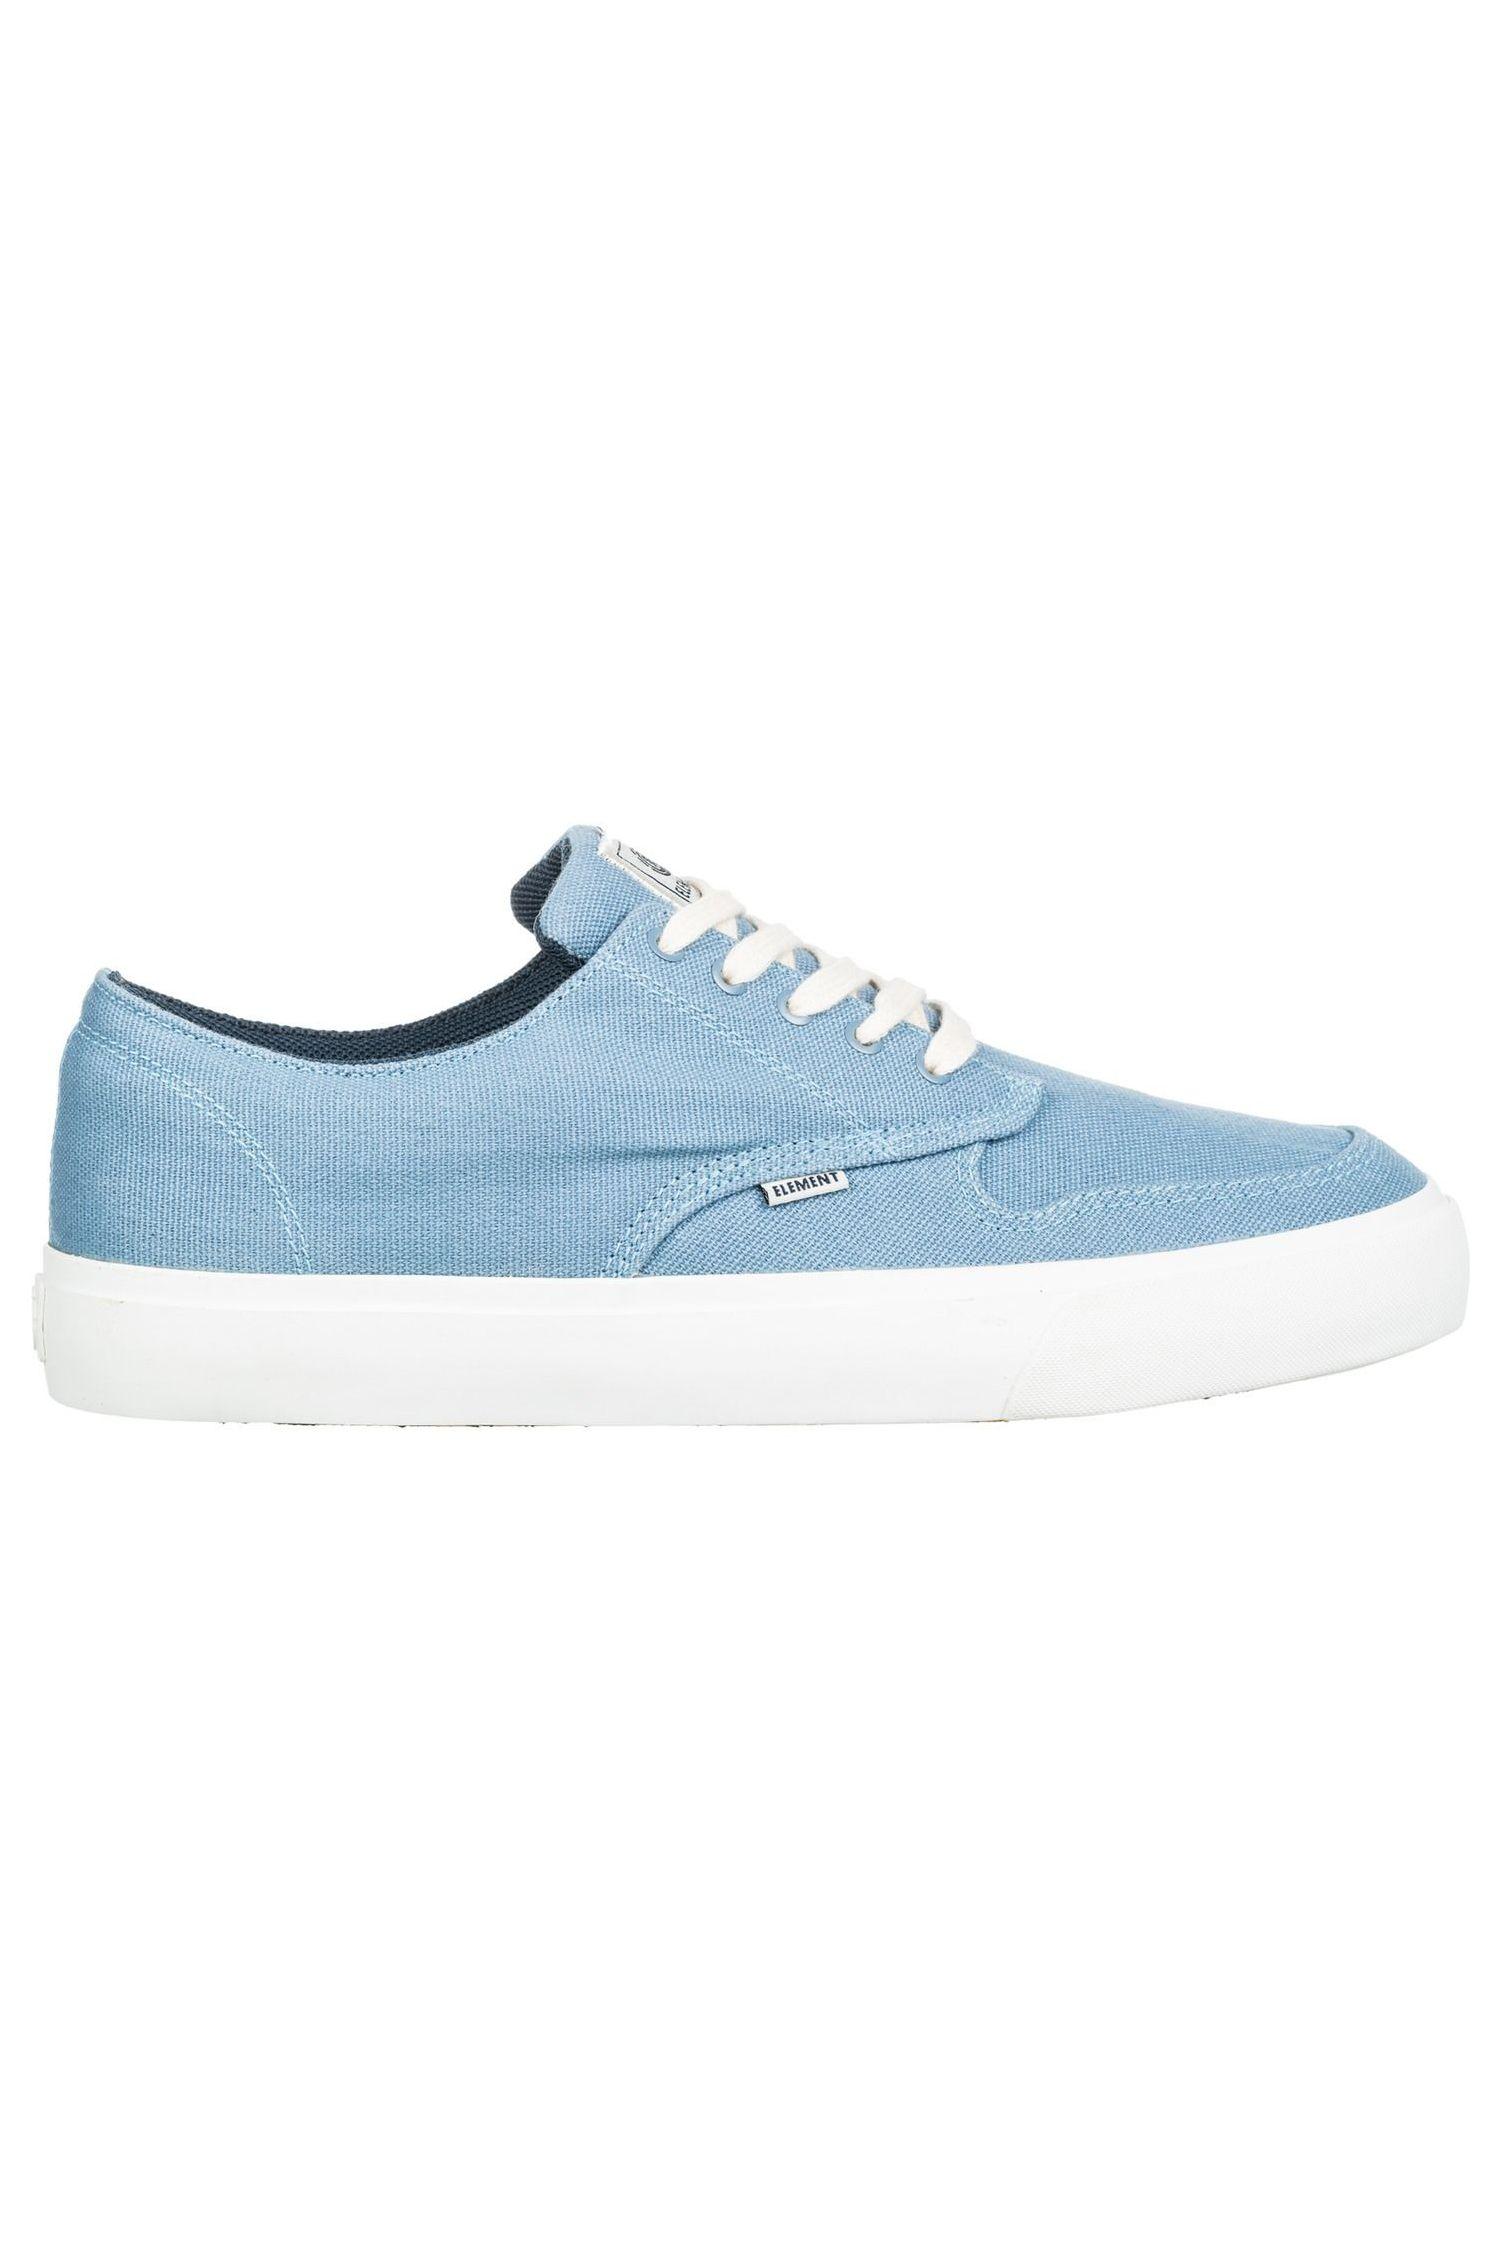 Element Shoes TOPAZ C3 Faded Denim